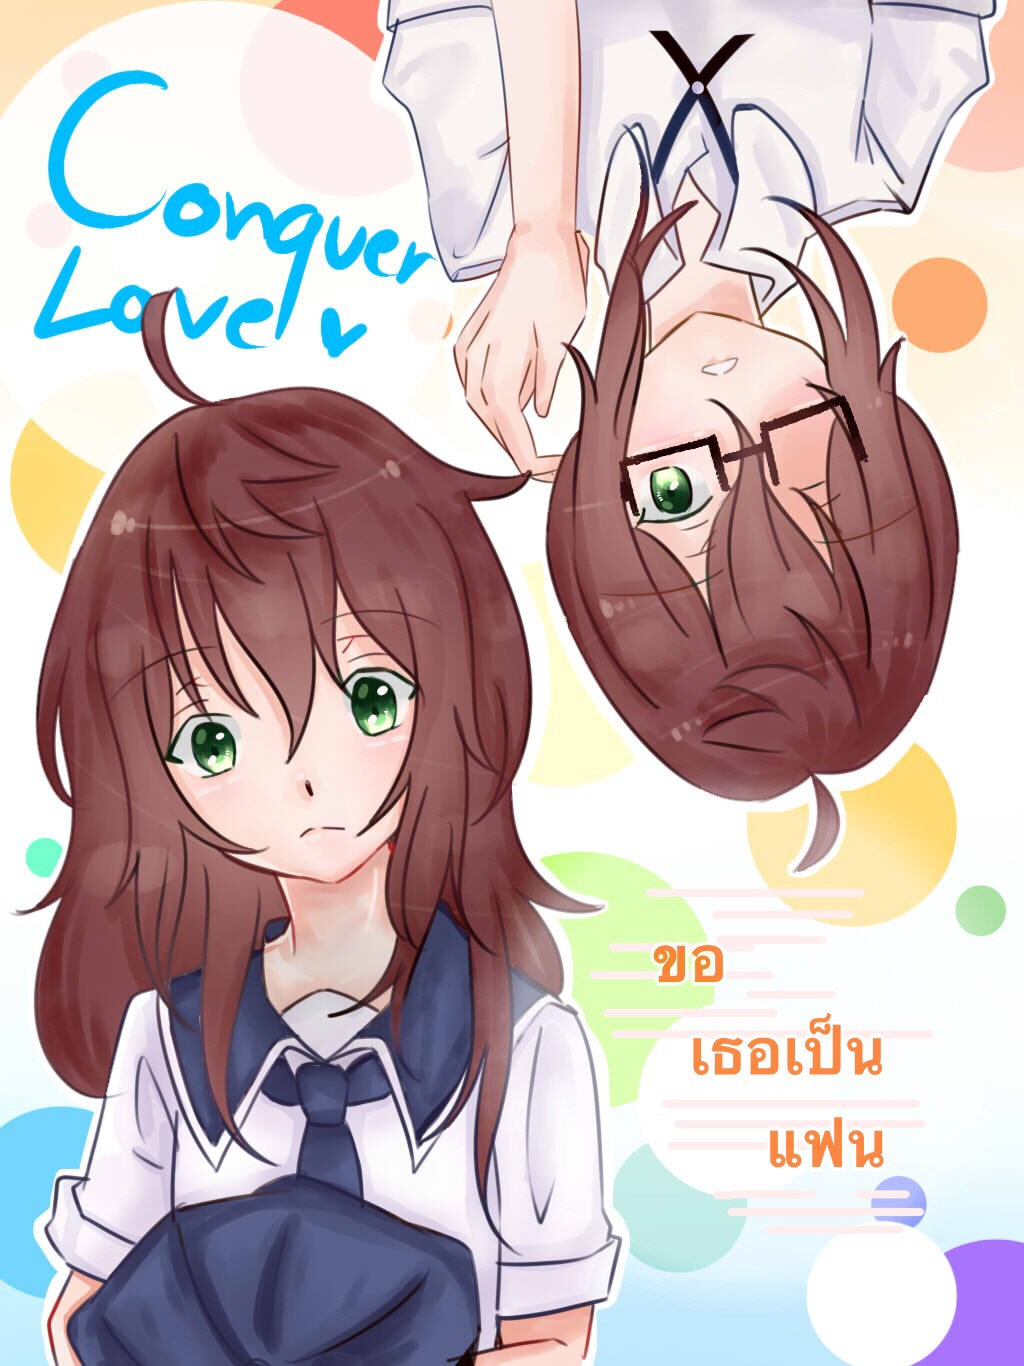 Conquer Love ขอเธอเป็นแฟน